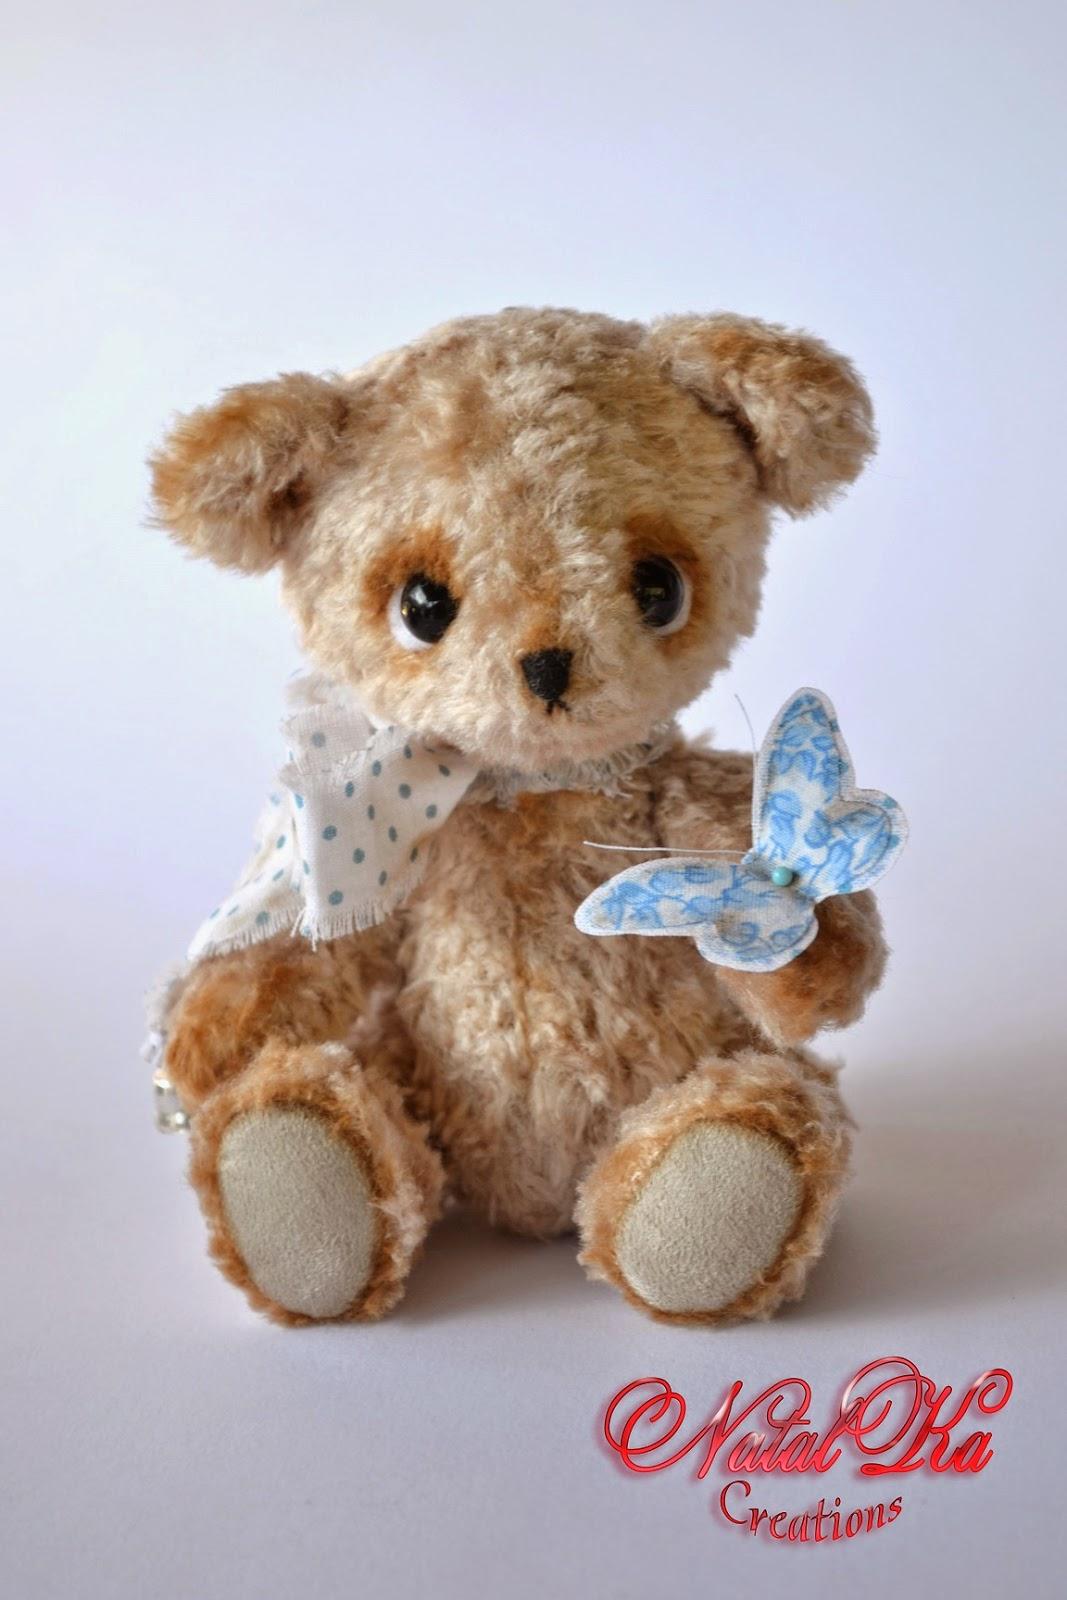 Künstler Teddybär handgemacht von NatalKa Creations. Авторский мишка тедди ручной работы от NatalKa Creations.